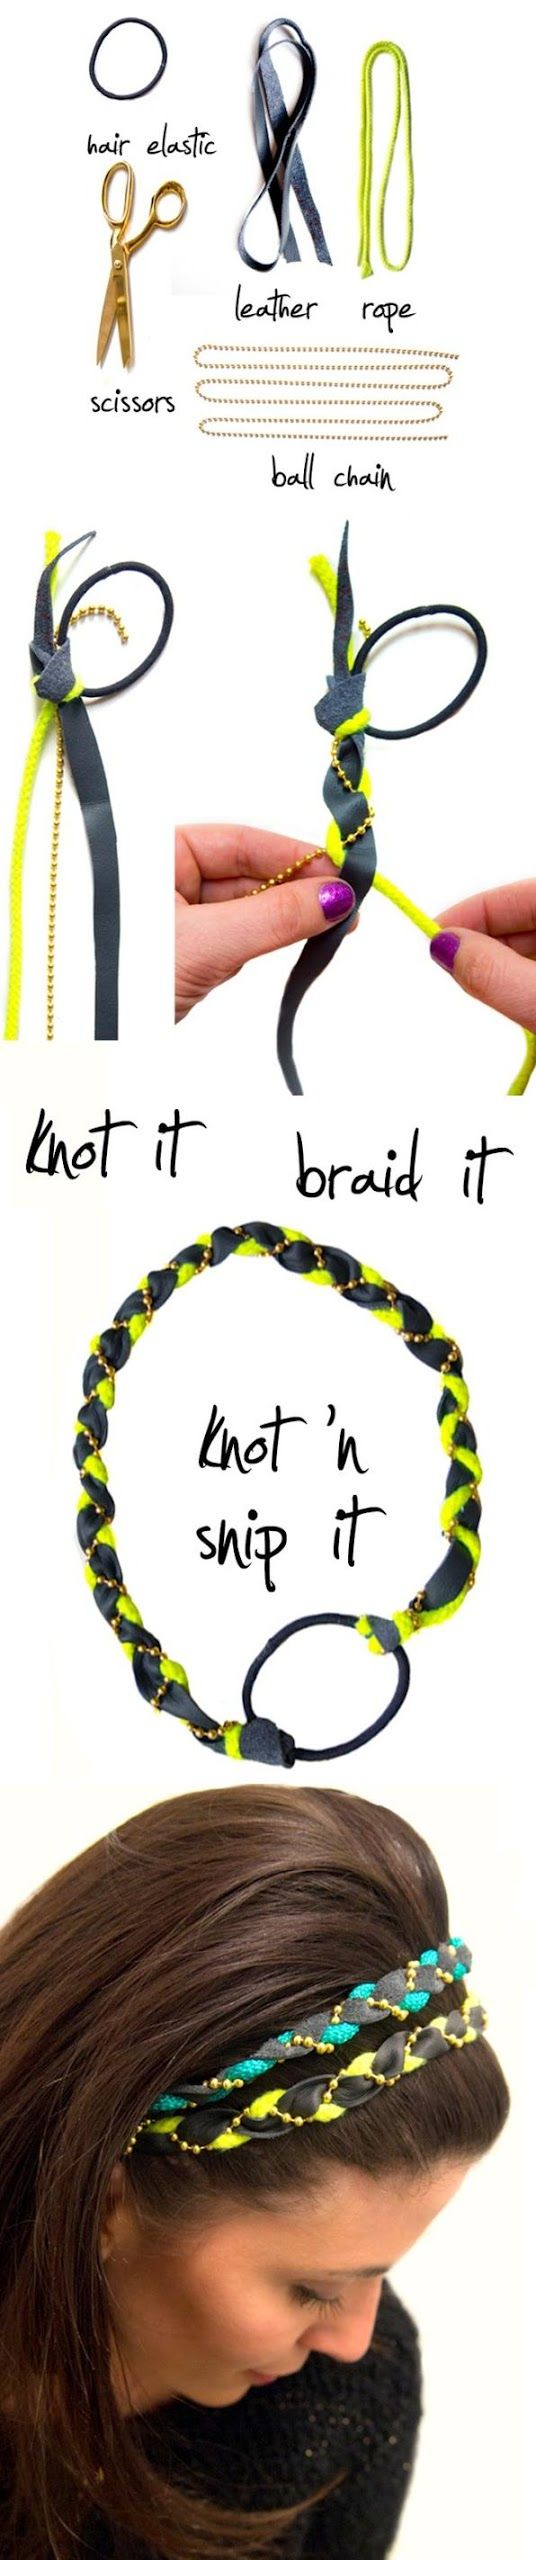 DIY: Quick & Easy Braided Headband